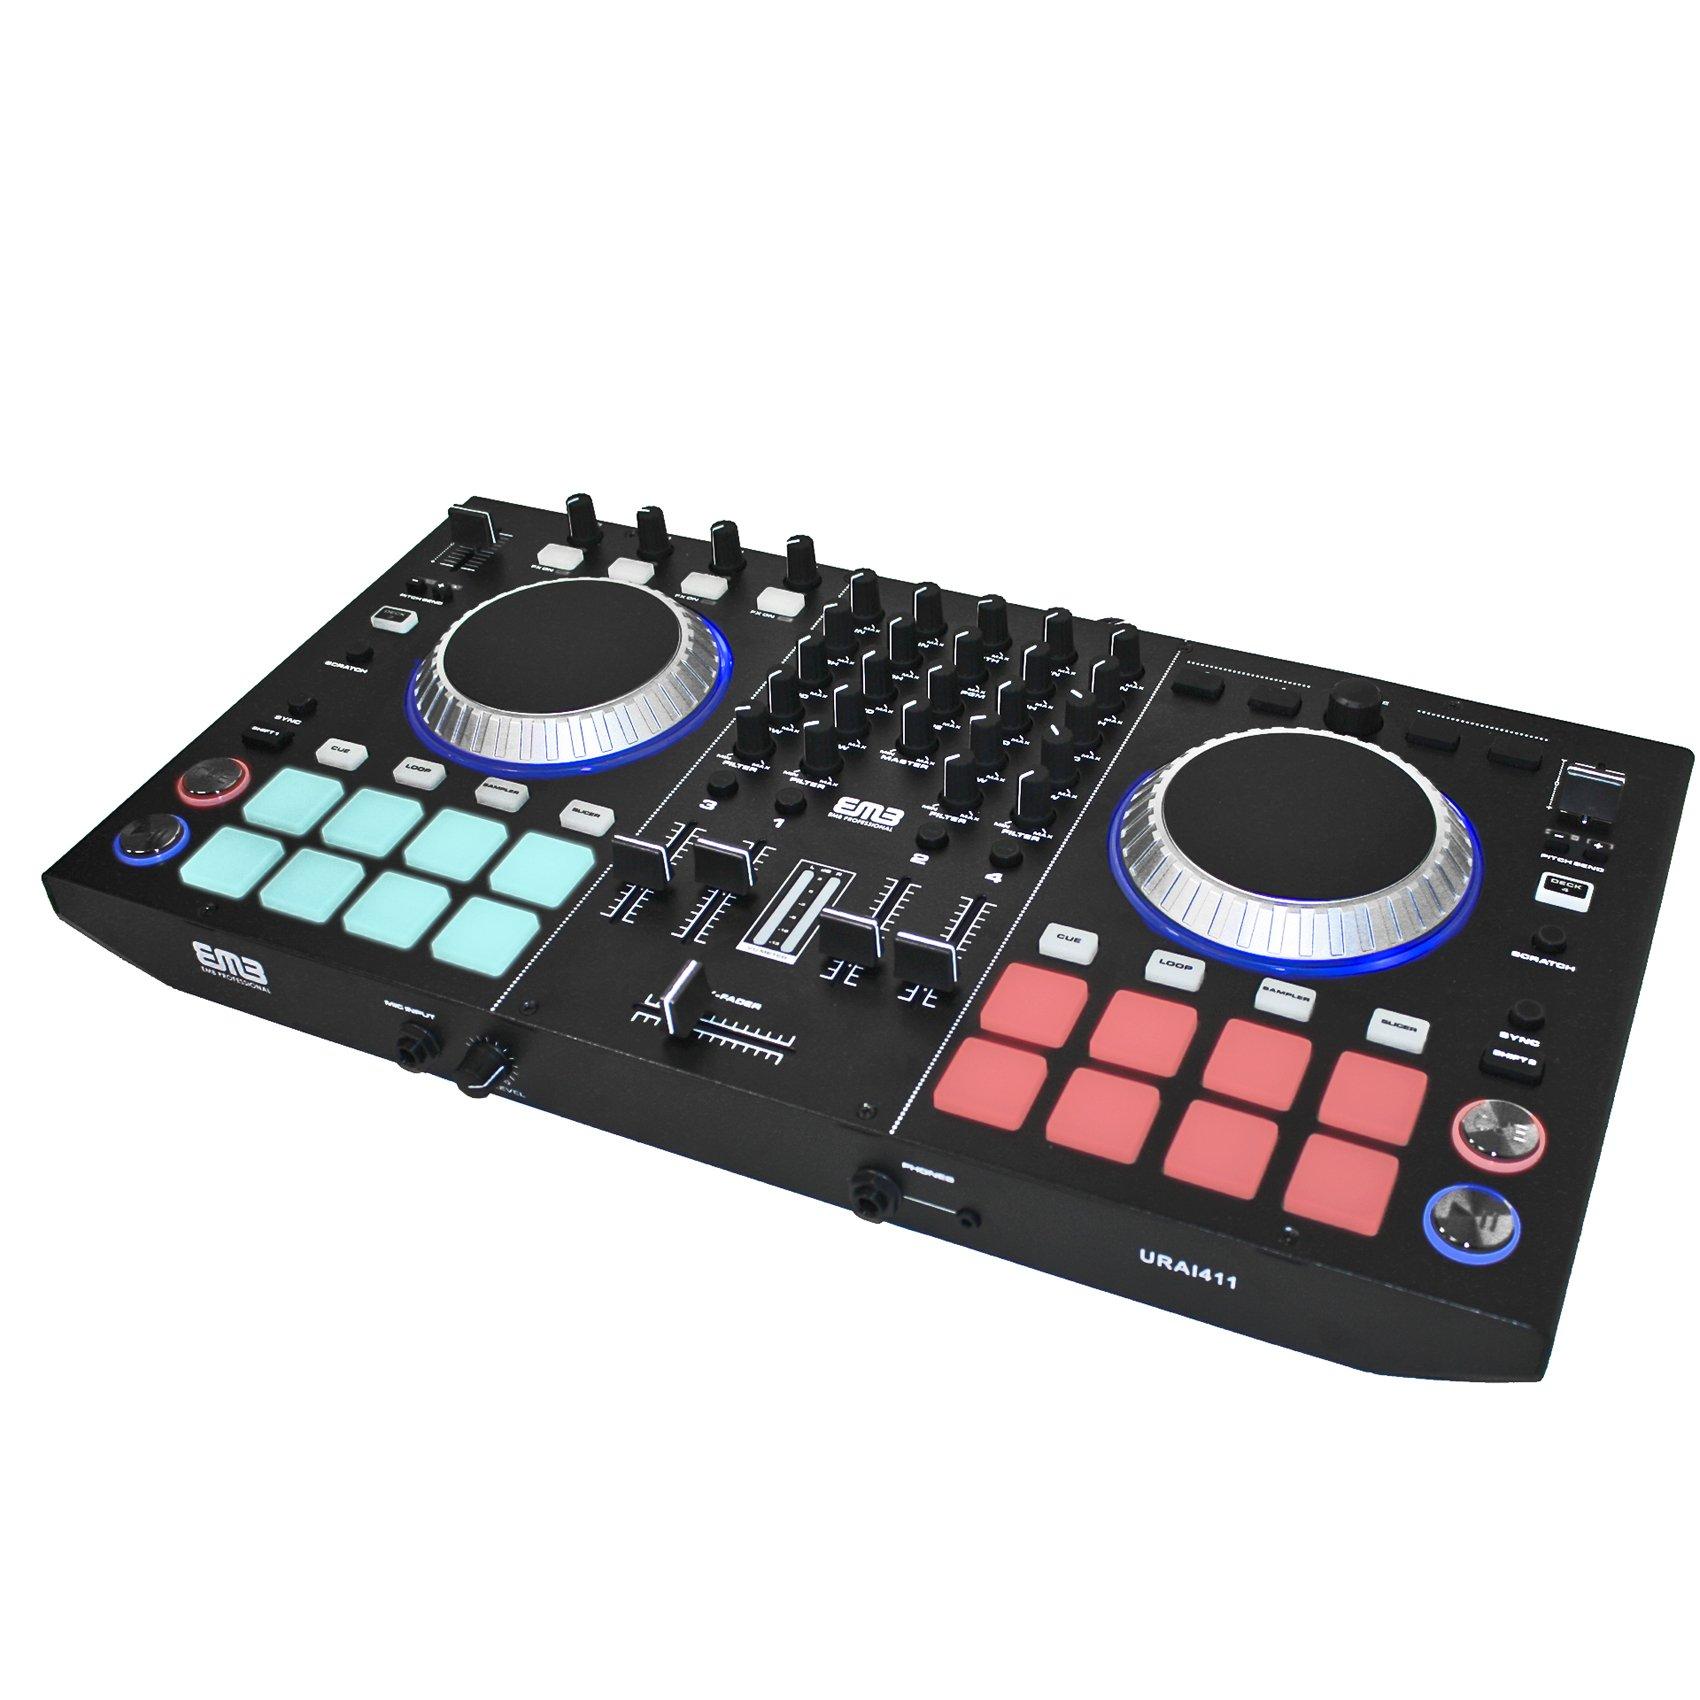 emb urai411 professional controller 4 channels ready dj mixer with effects 2 jog wheels. Black Bedroom Furniture Sets. Home Design Ideas